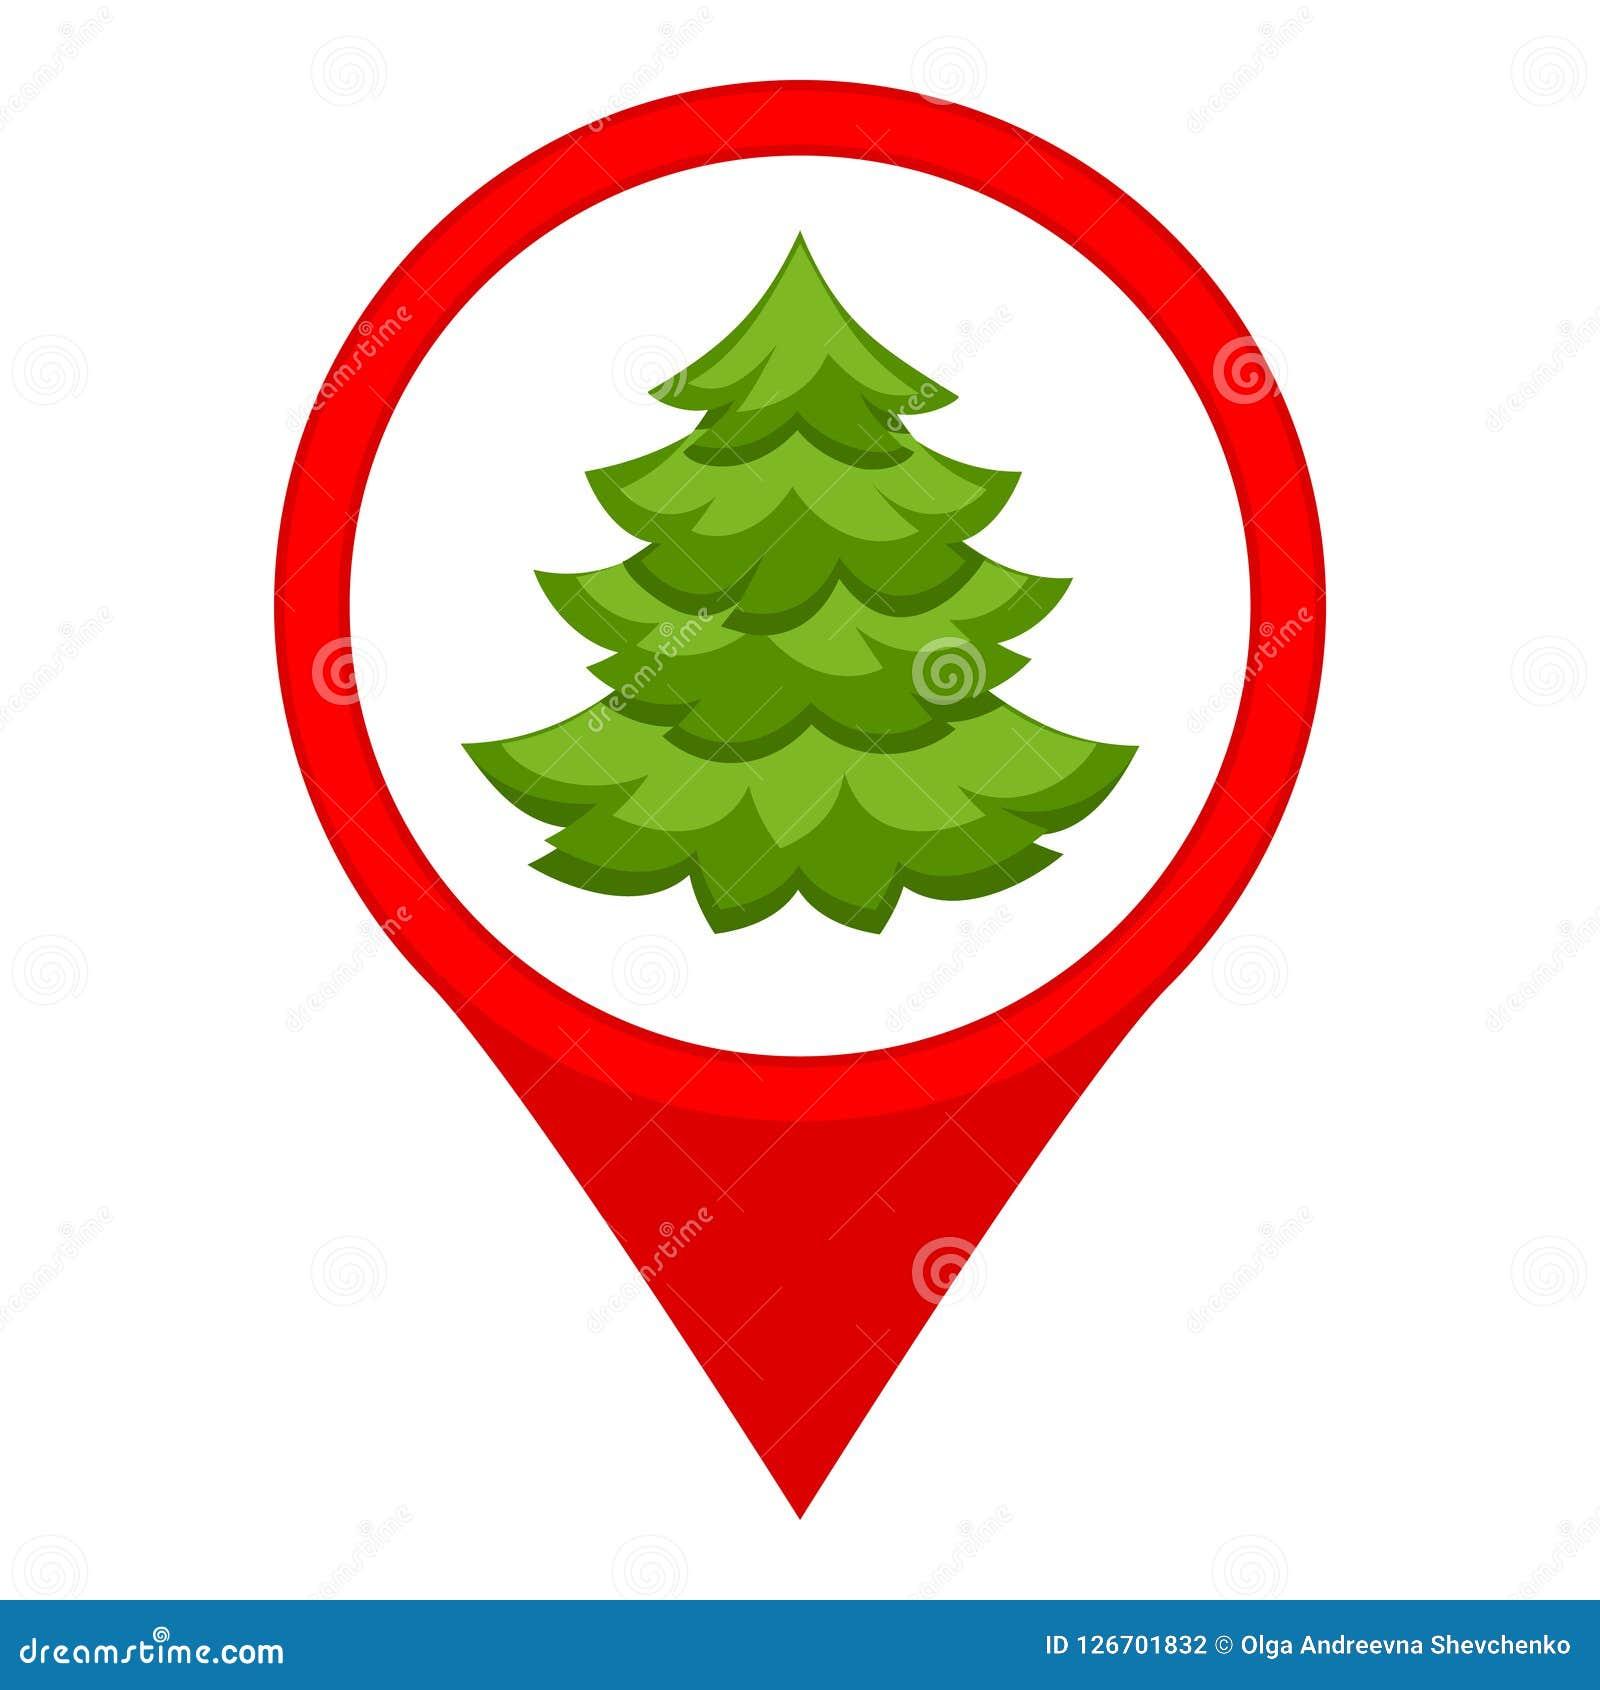 Colorful Cartoon Christmas Tree Market Map Sign Stock Vector